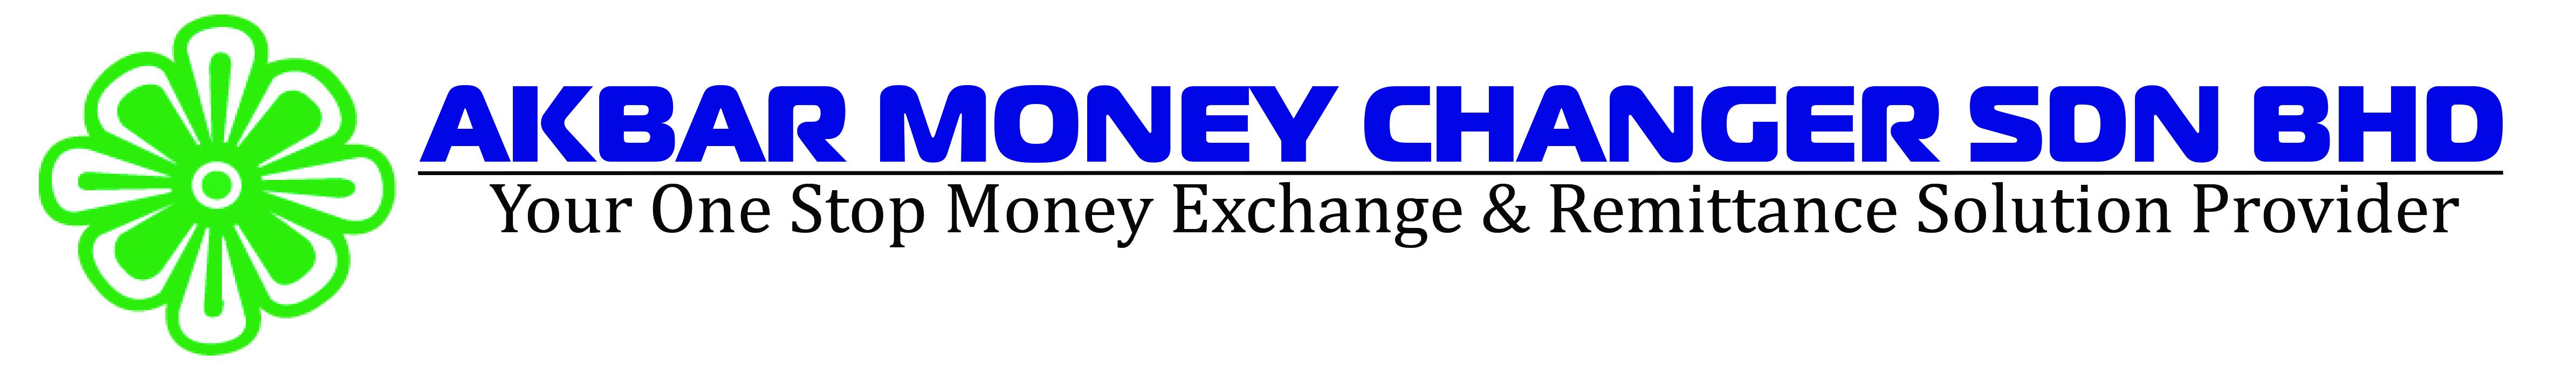 Akbar Money Changer Sdn Bhd